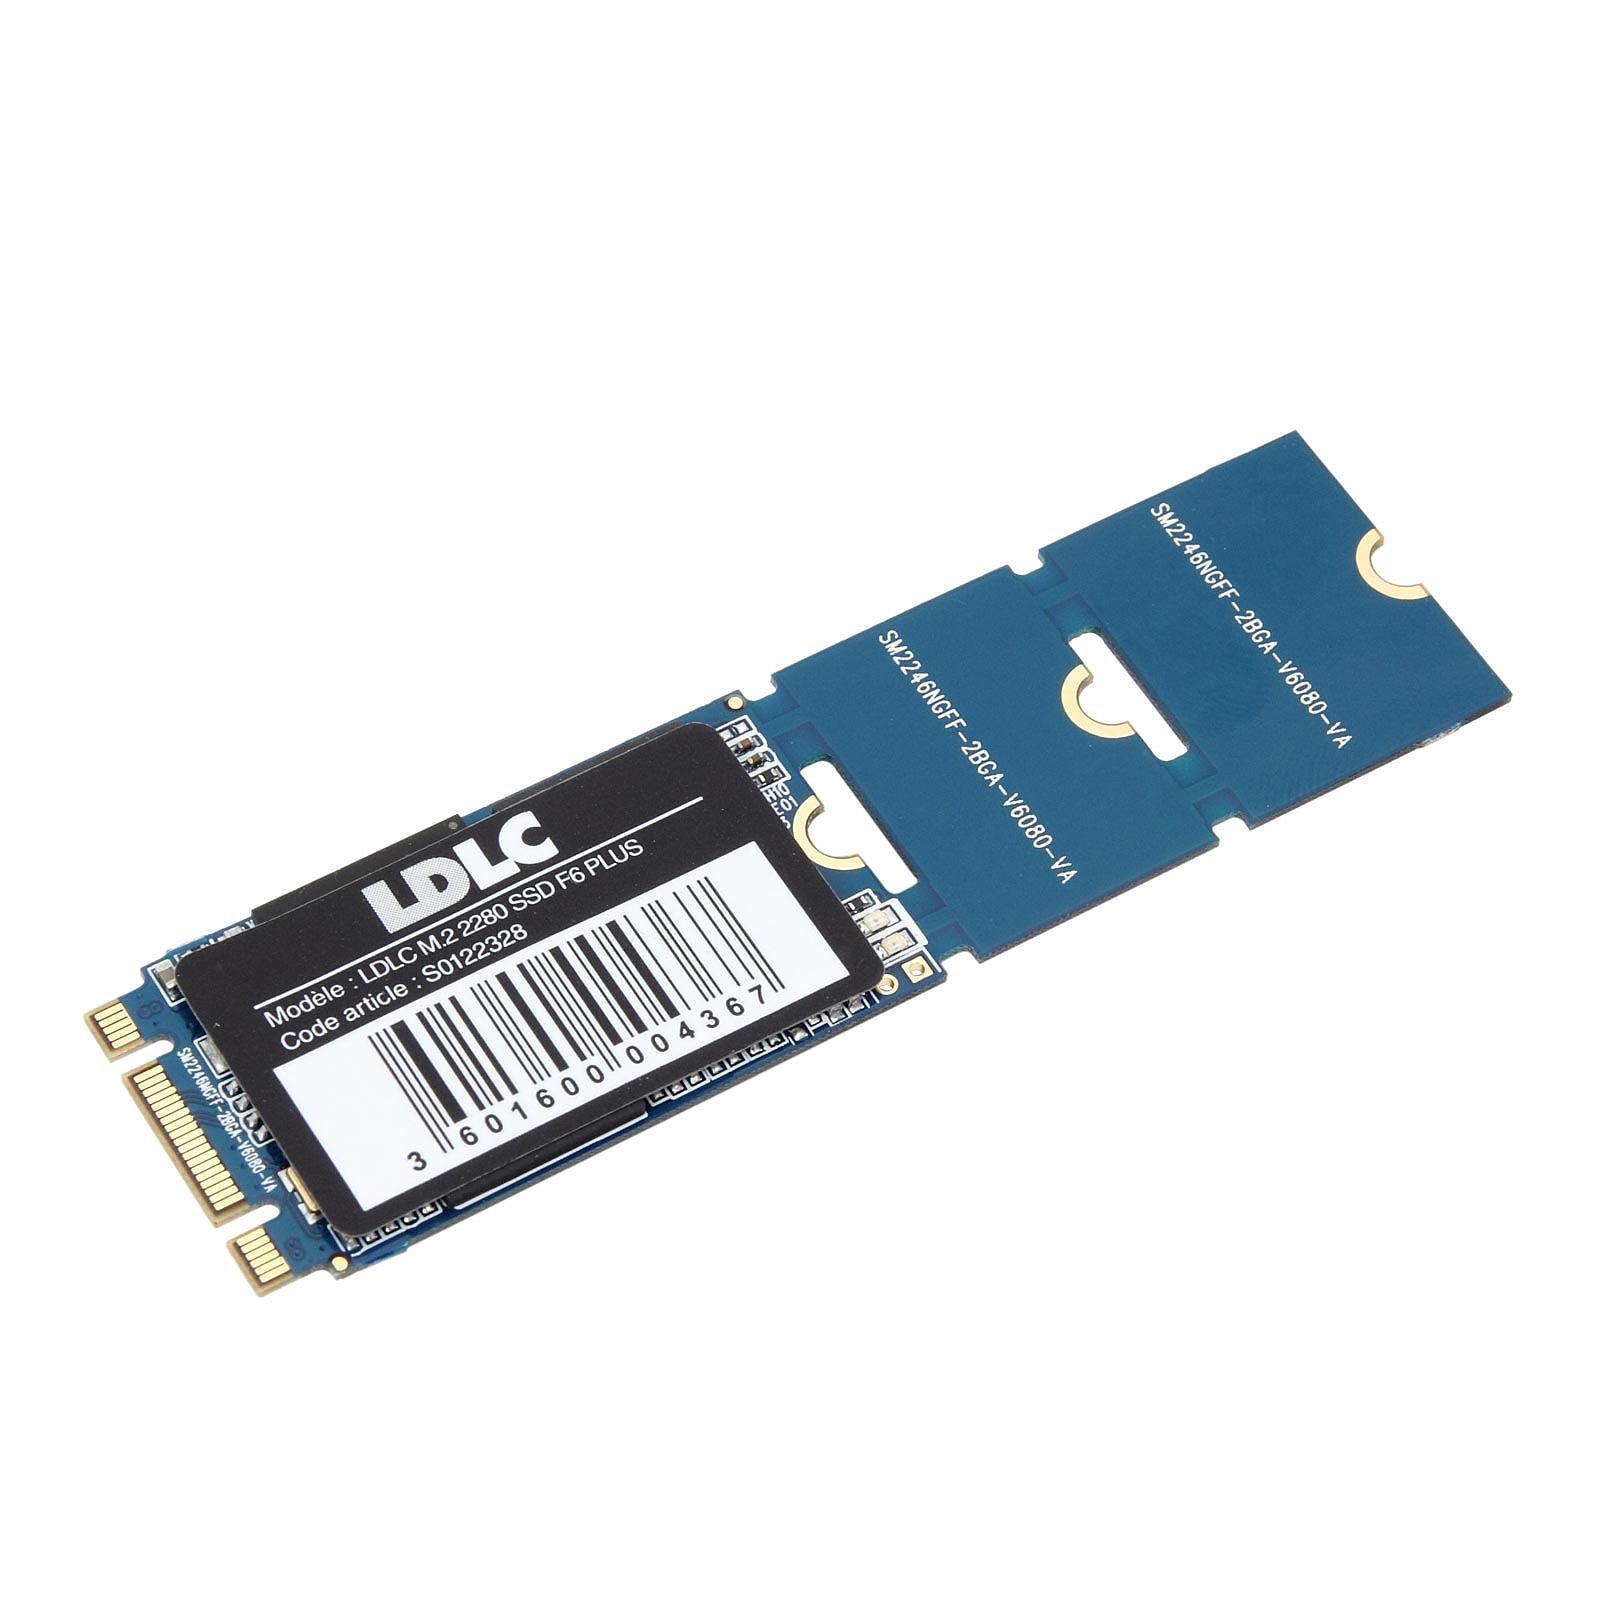 LDLC SSD M.2 2280 F6 PLUS 480 GB